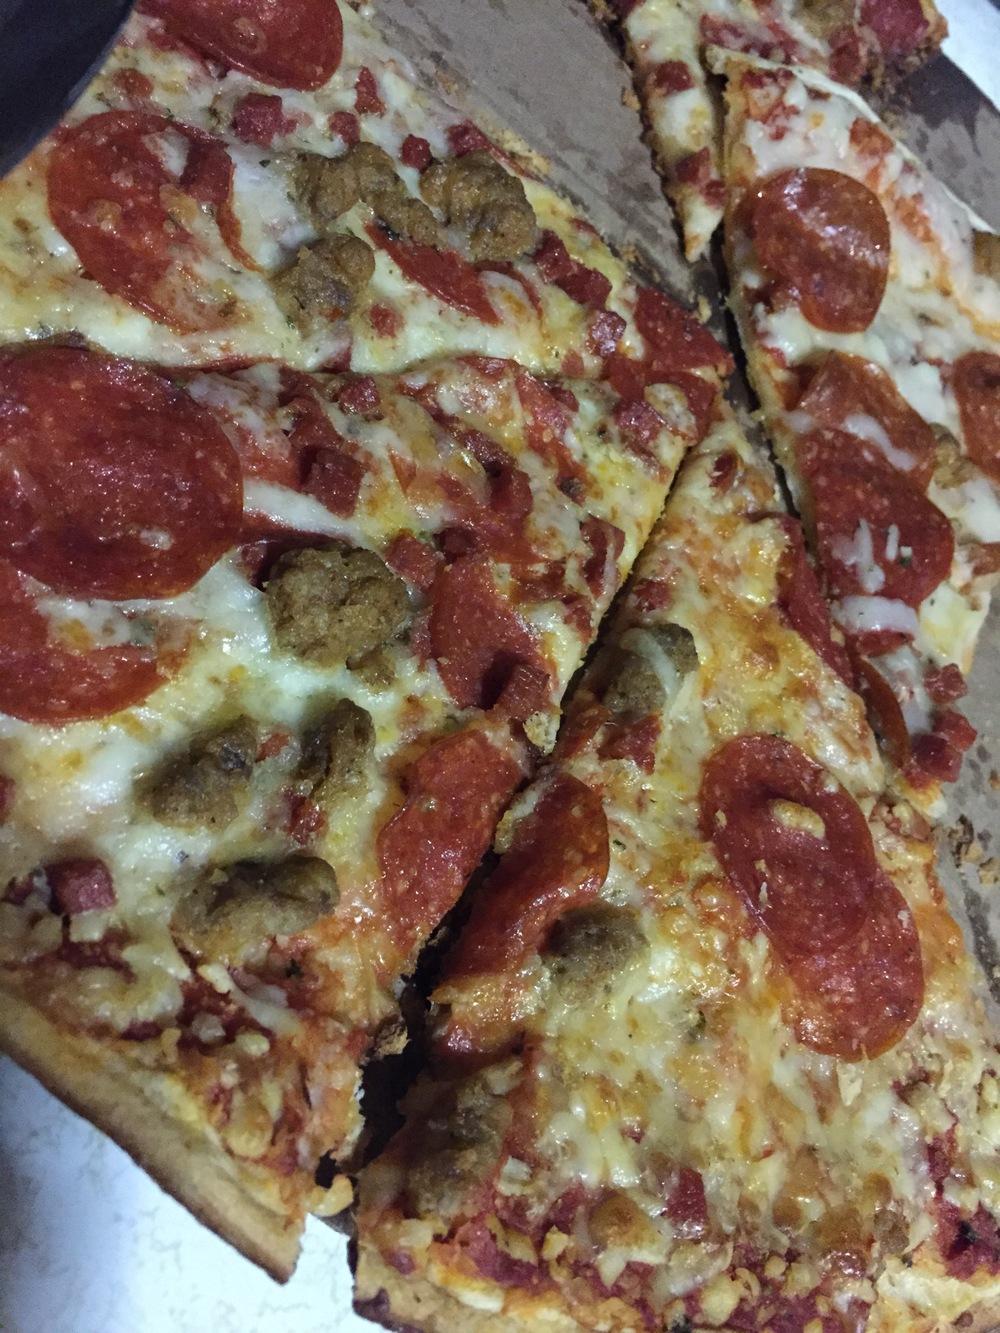 When I said family, I really meant pizza. Just kidding, I meant family. Okay...both.